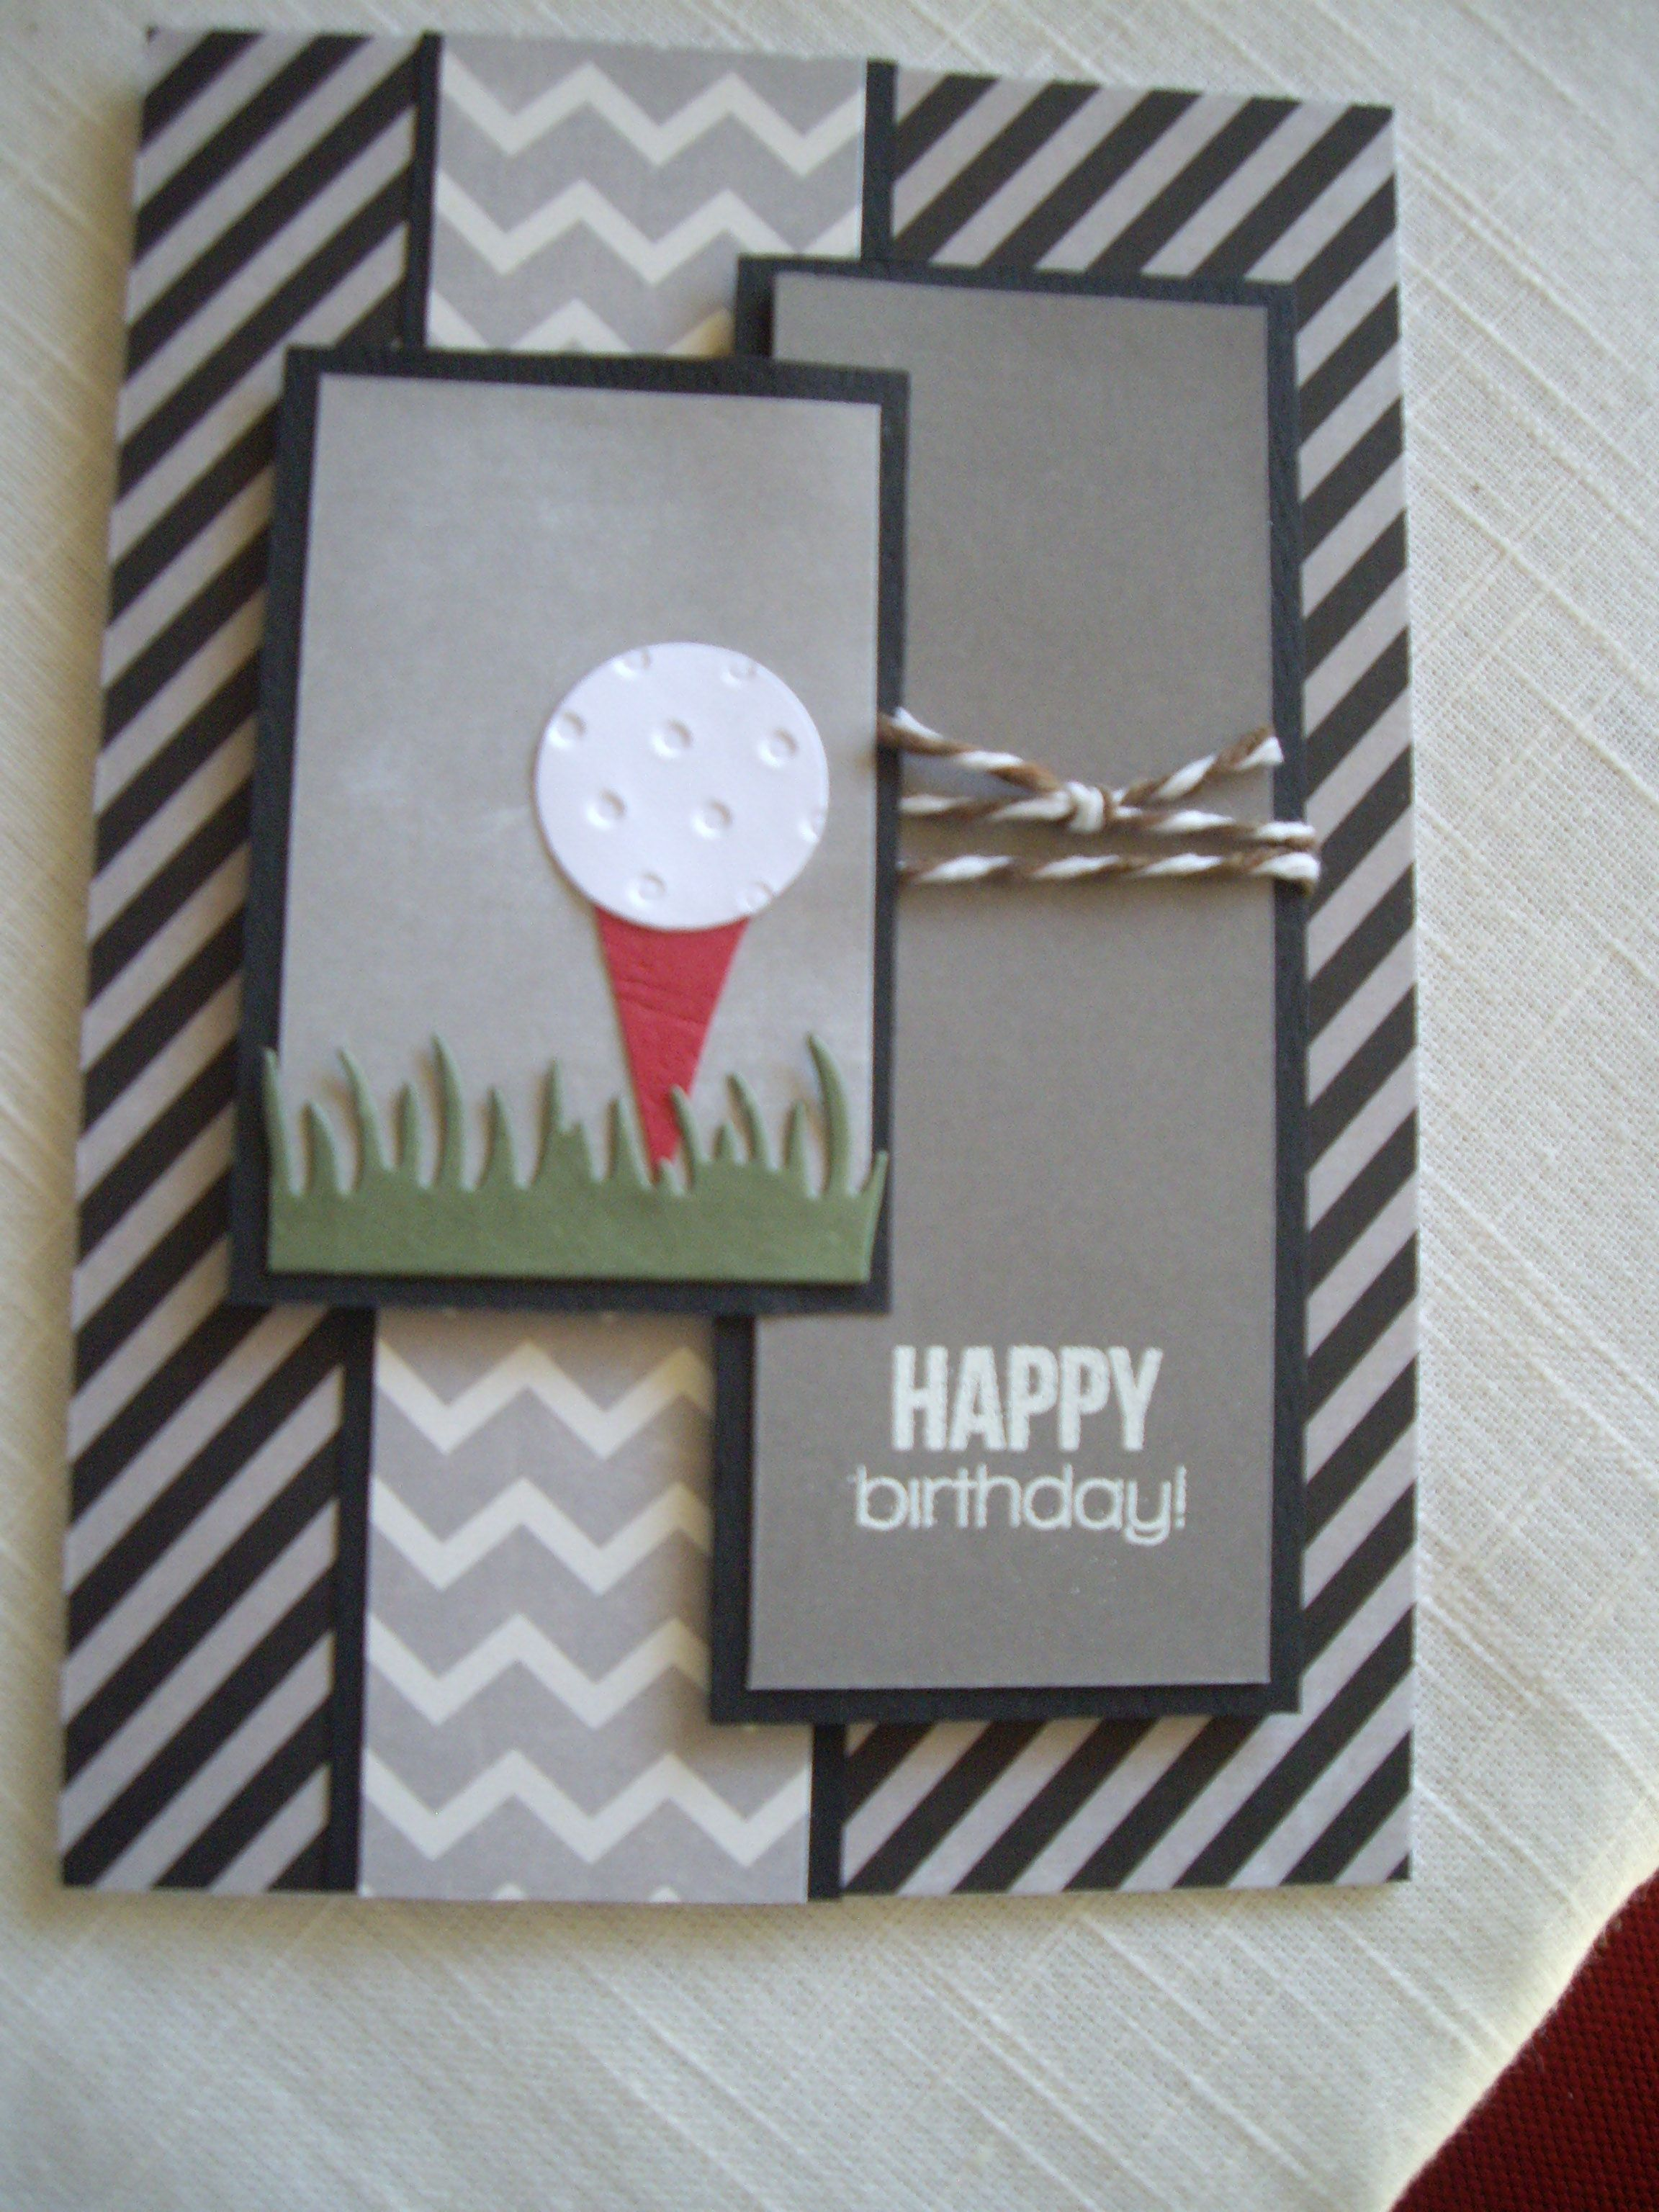 Masculine Card For Golfer Cards Handmade Homemade Birthday Cards Themed Cards